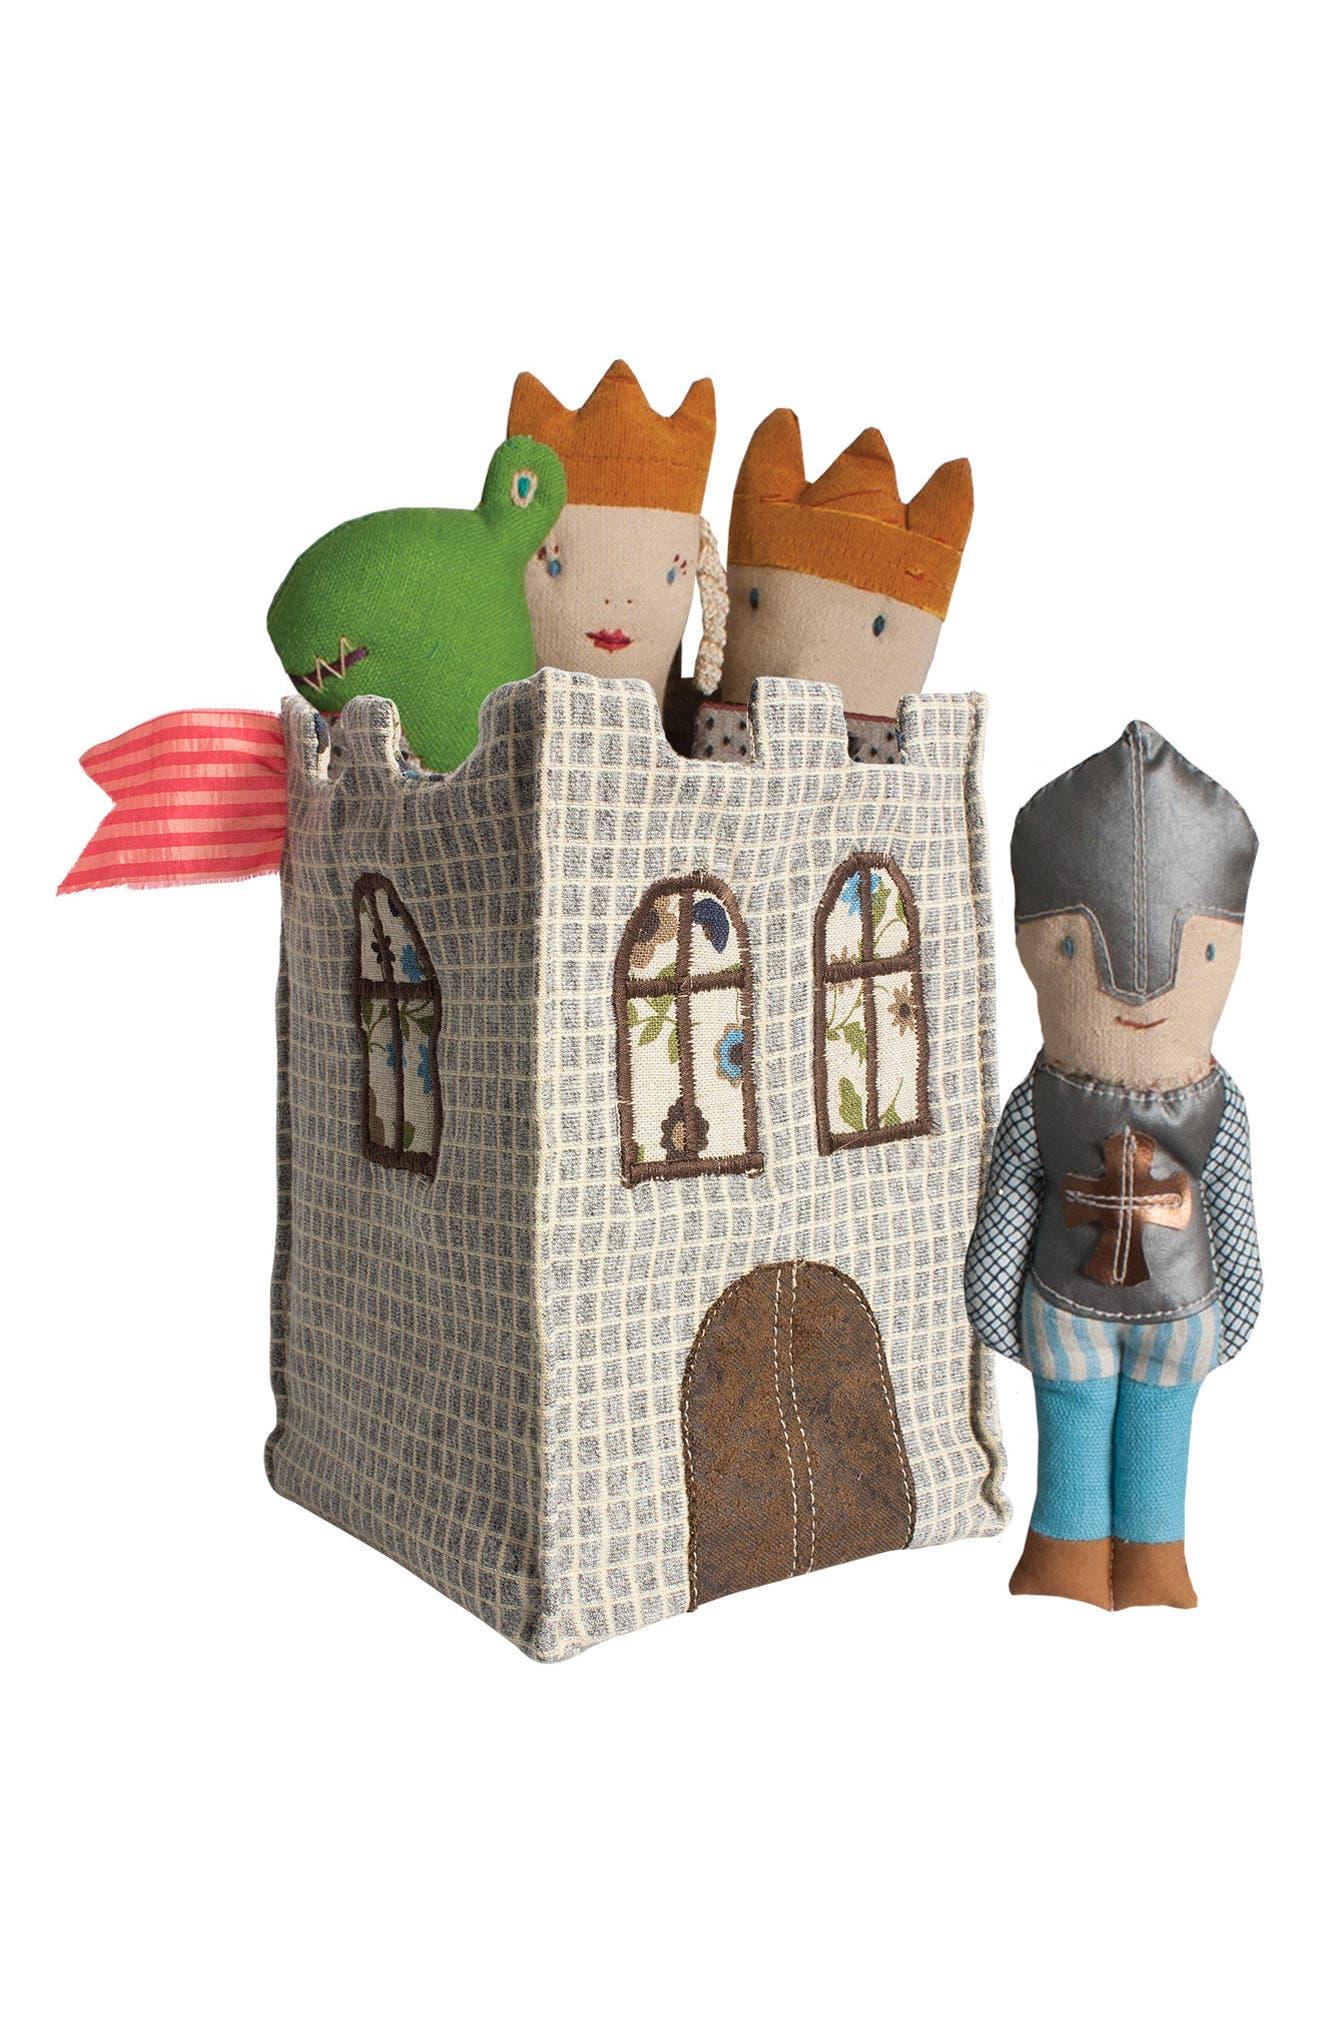 Castle & Knight Rattle 5-Piece Play Set,                             Main thumbnail 1, color,                             200